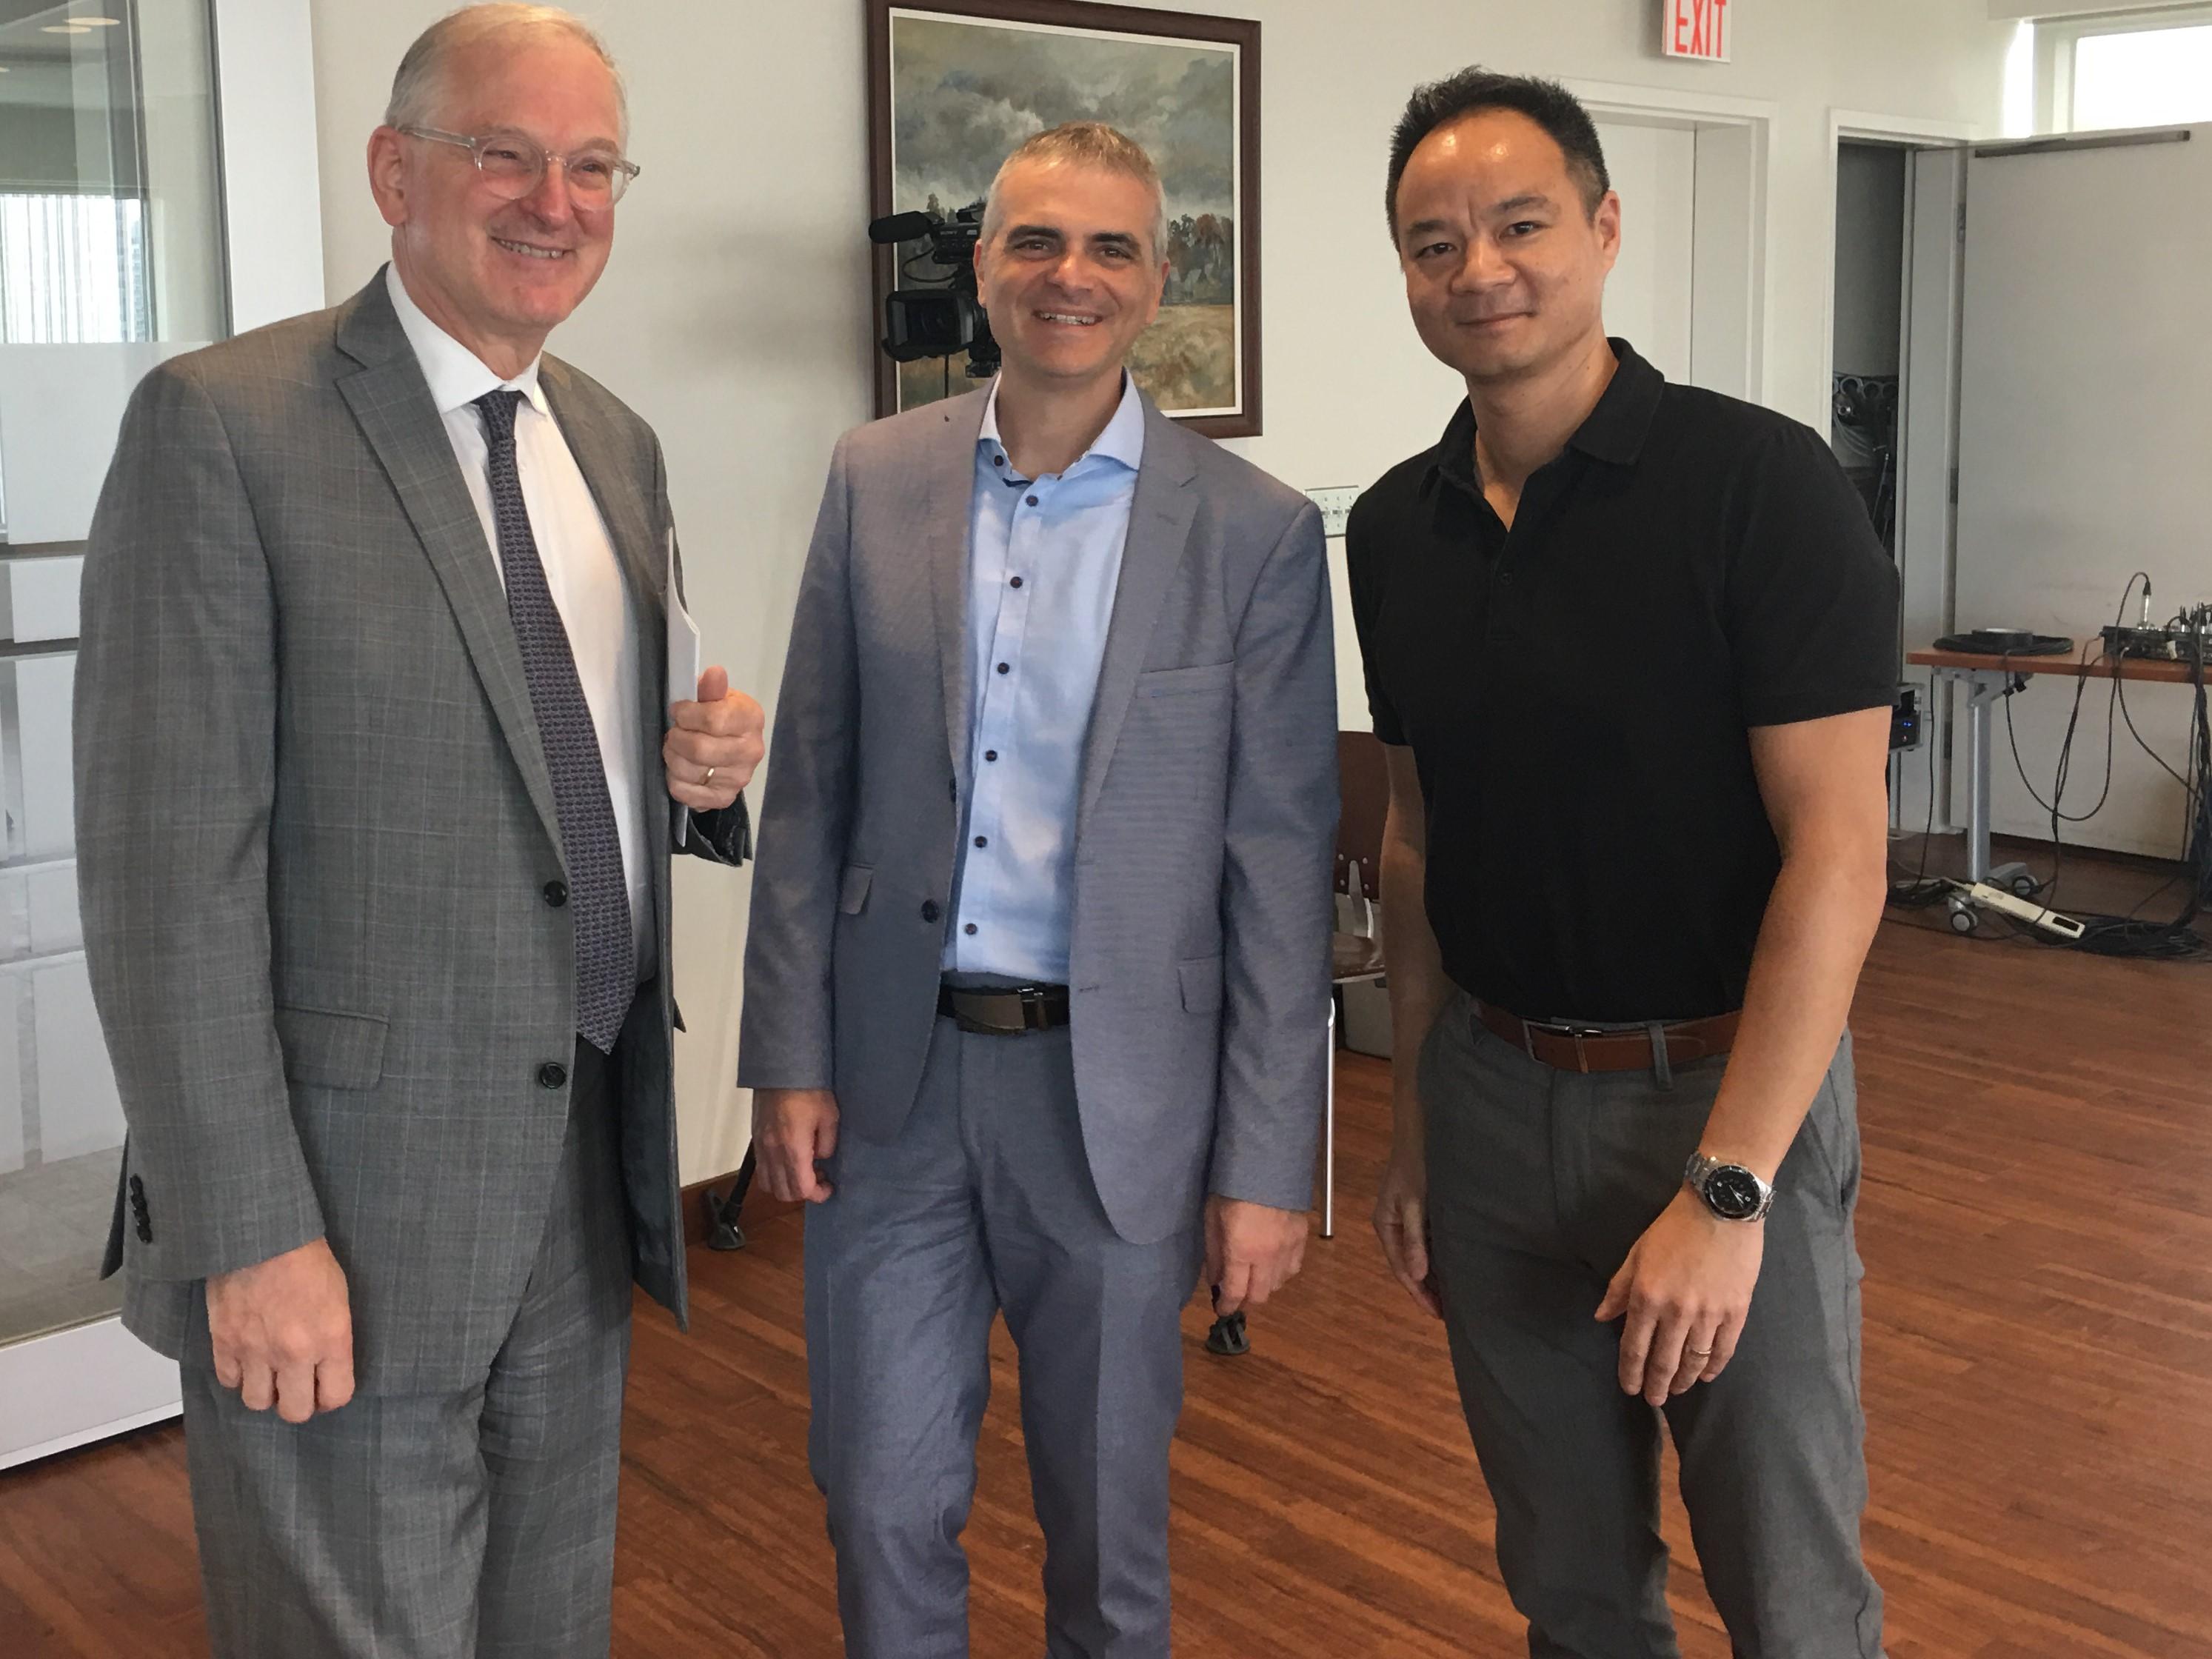 Martin Bernier, Jacques Frémont, Huang LeHong